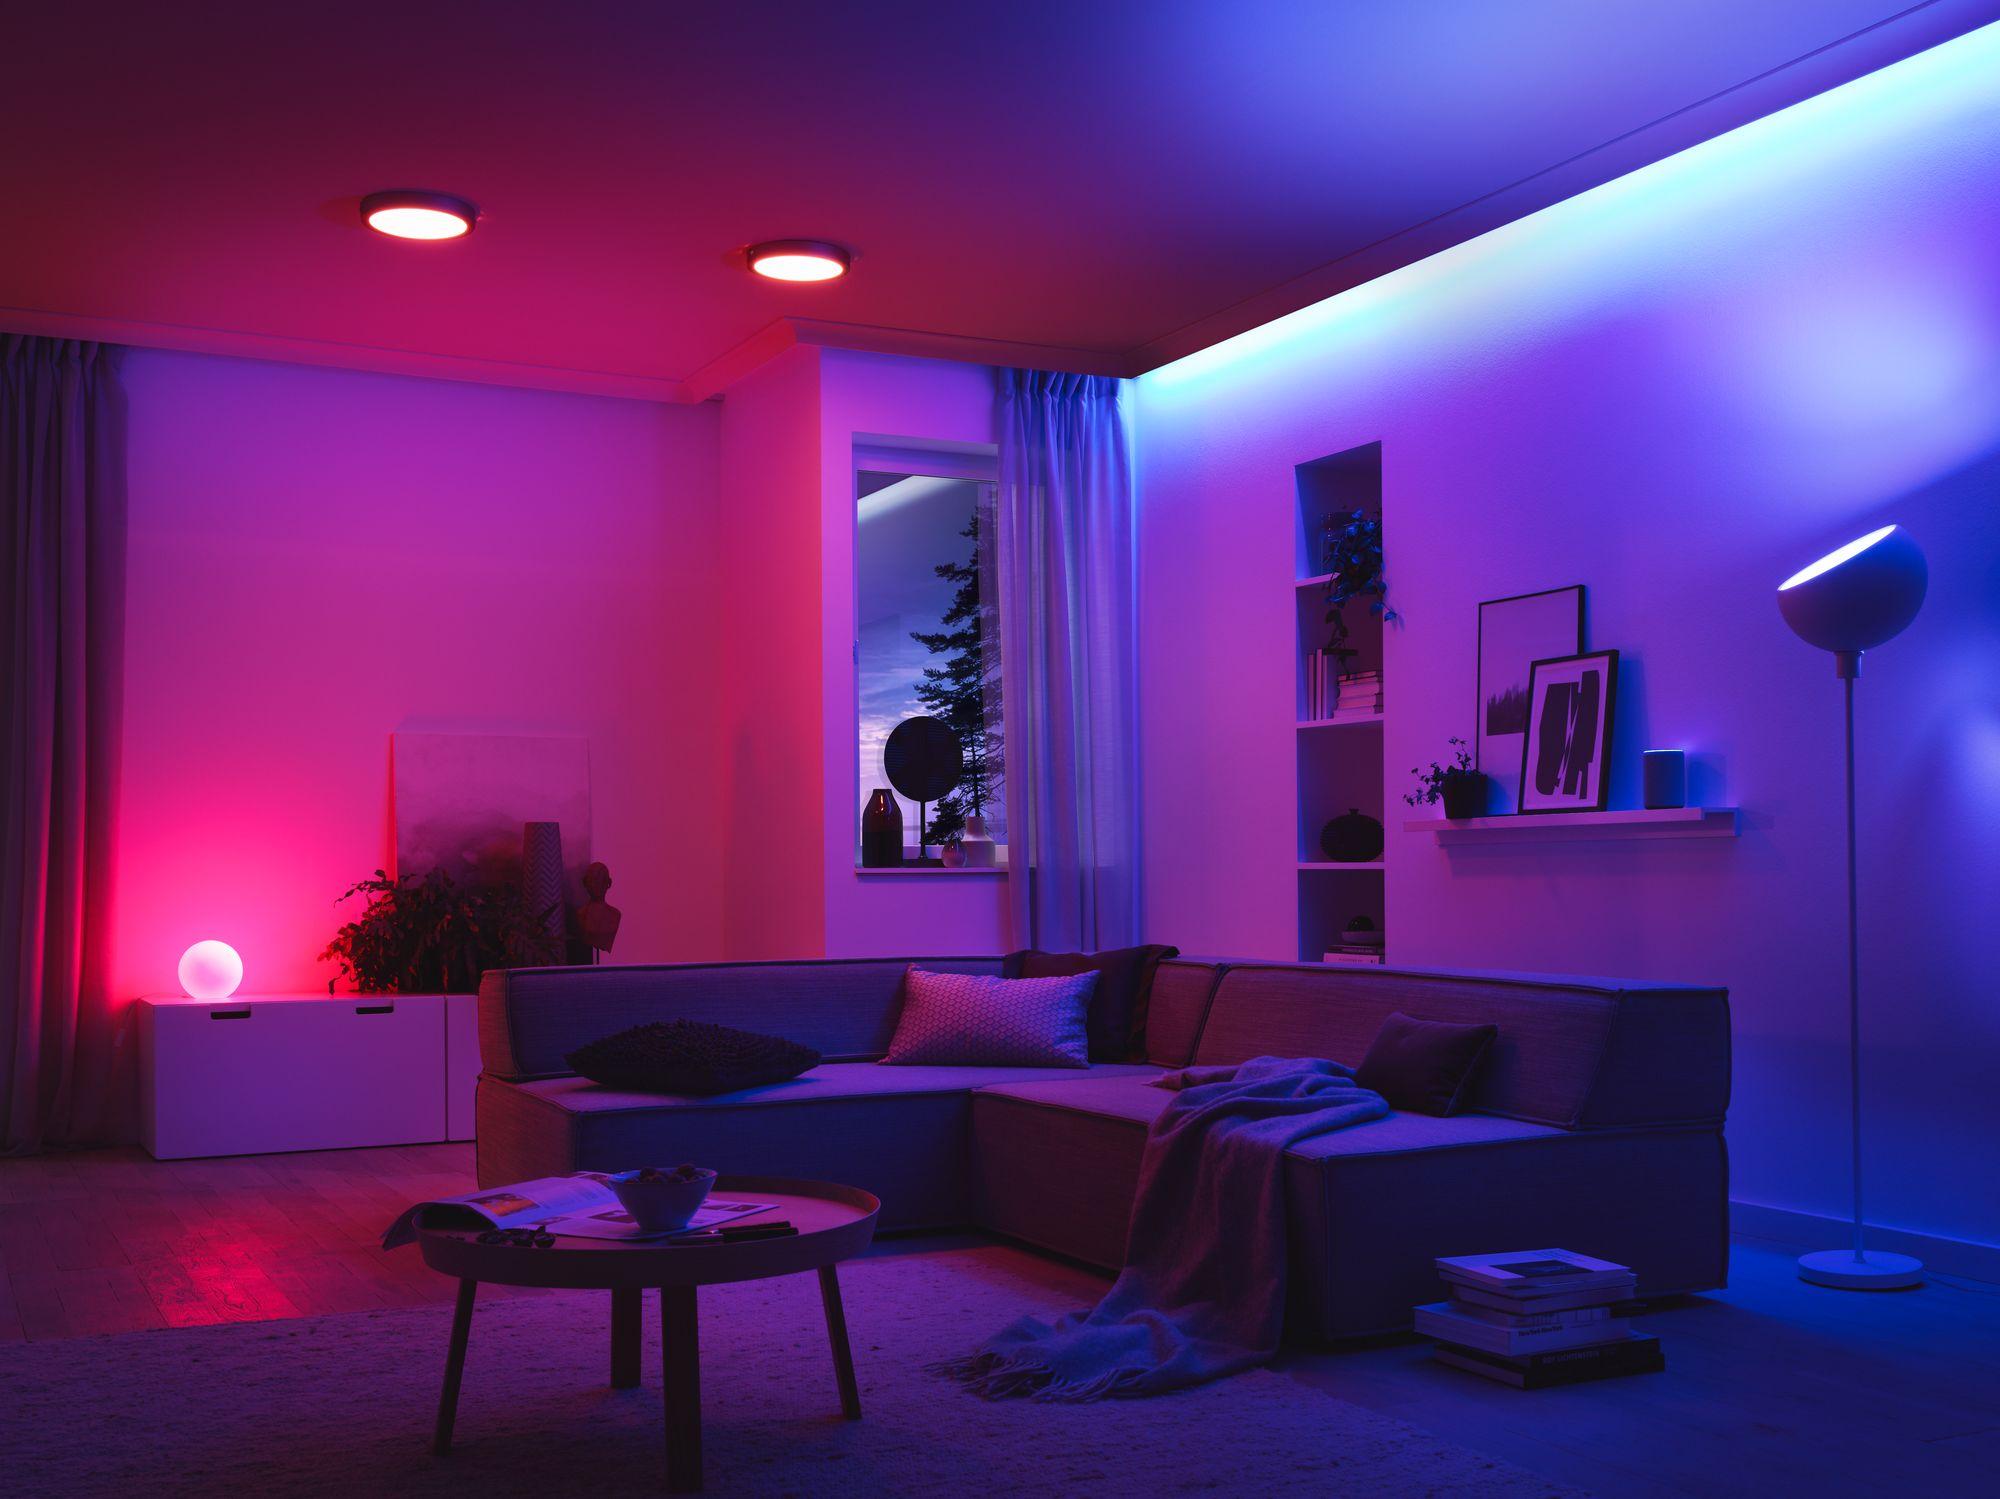 Photo of room using smart bulb